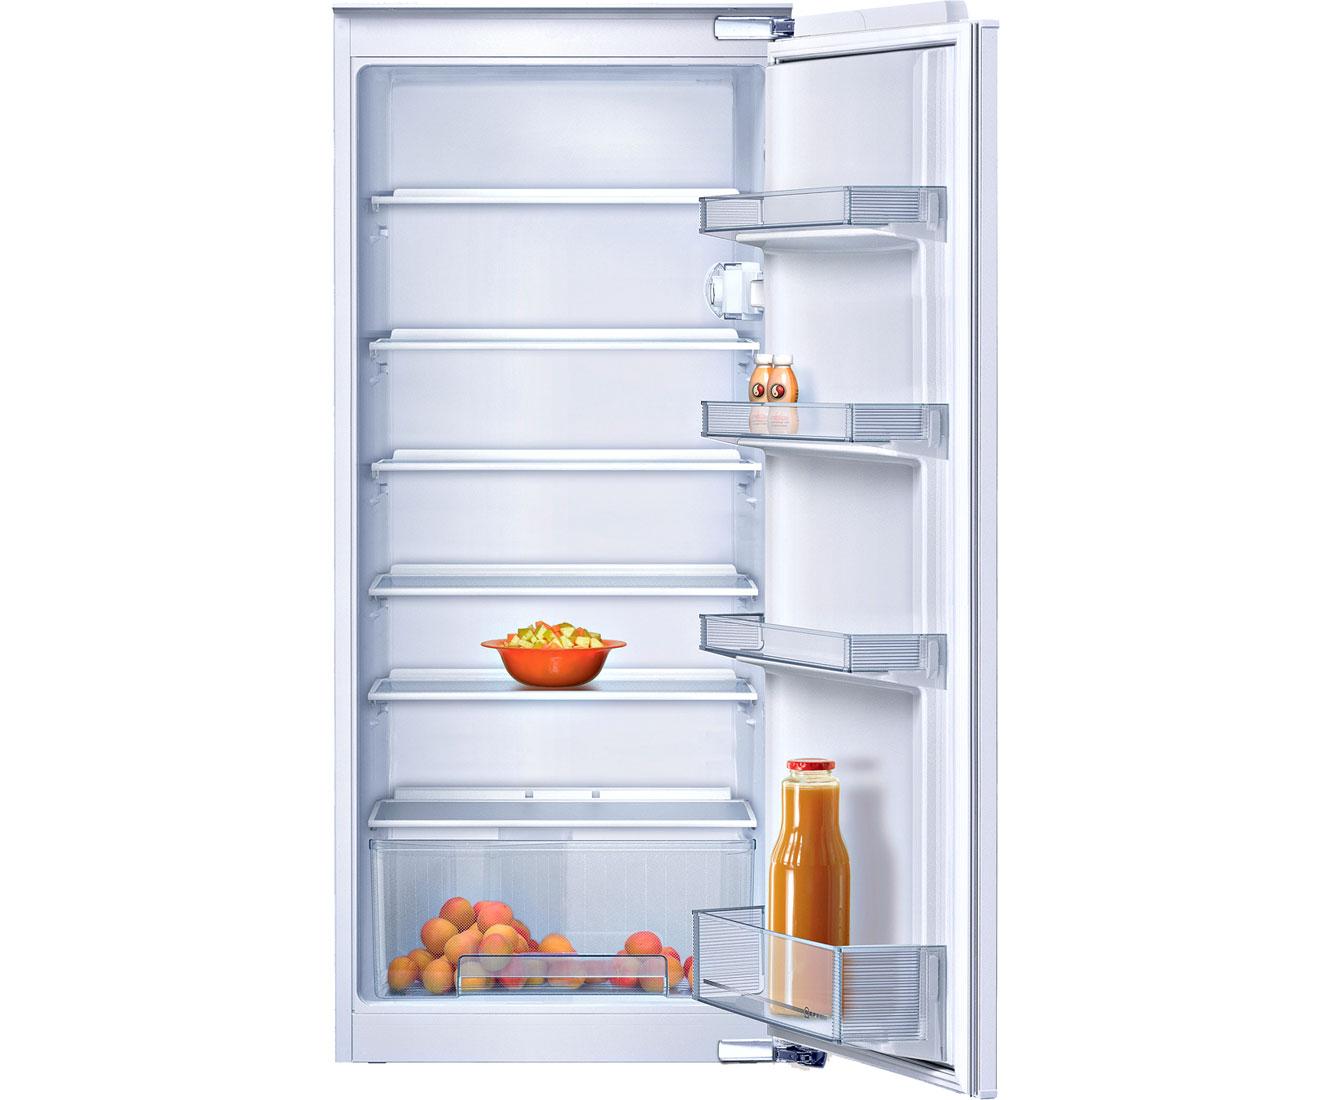 Kühlschrank Neff Ersatzteile : Neff kühlschrank ersatzteile gemüsefach obst gemüse schale fach